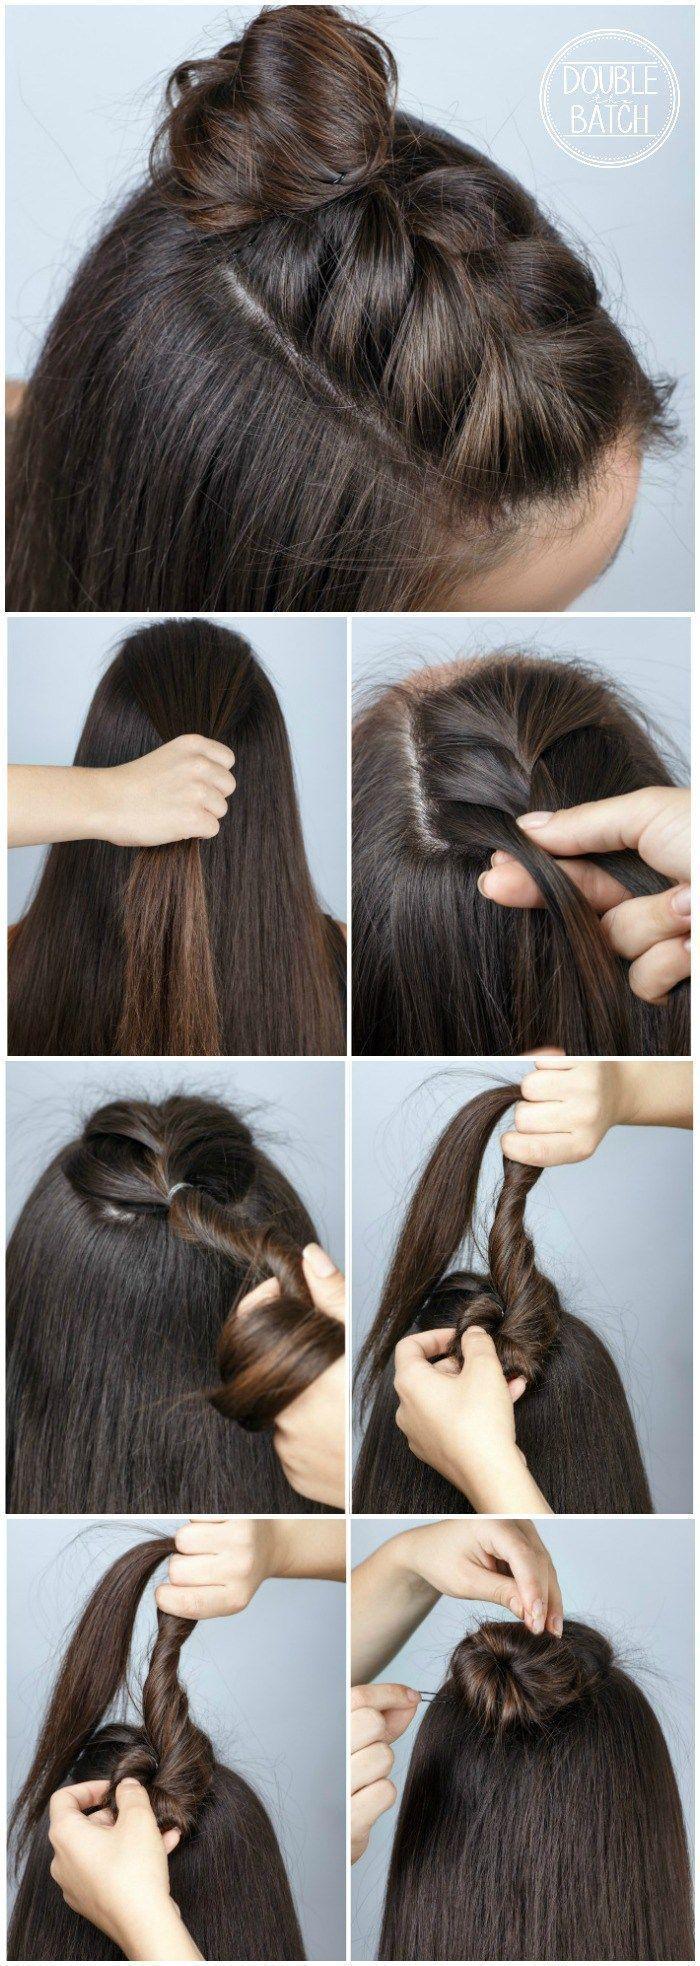 Tutoriel de coiffure facile demi-tresse – Tutoriel de coiffure vidéo – #braid #style #tutori …   – Hairstyle Women Hairdos